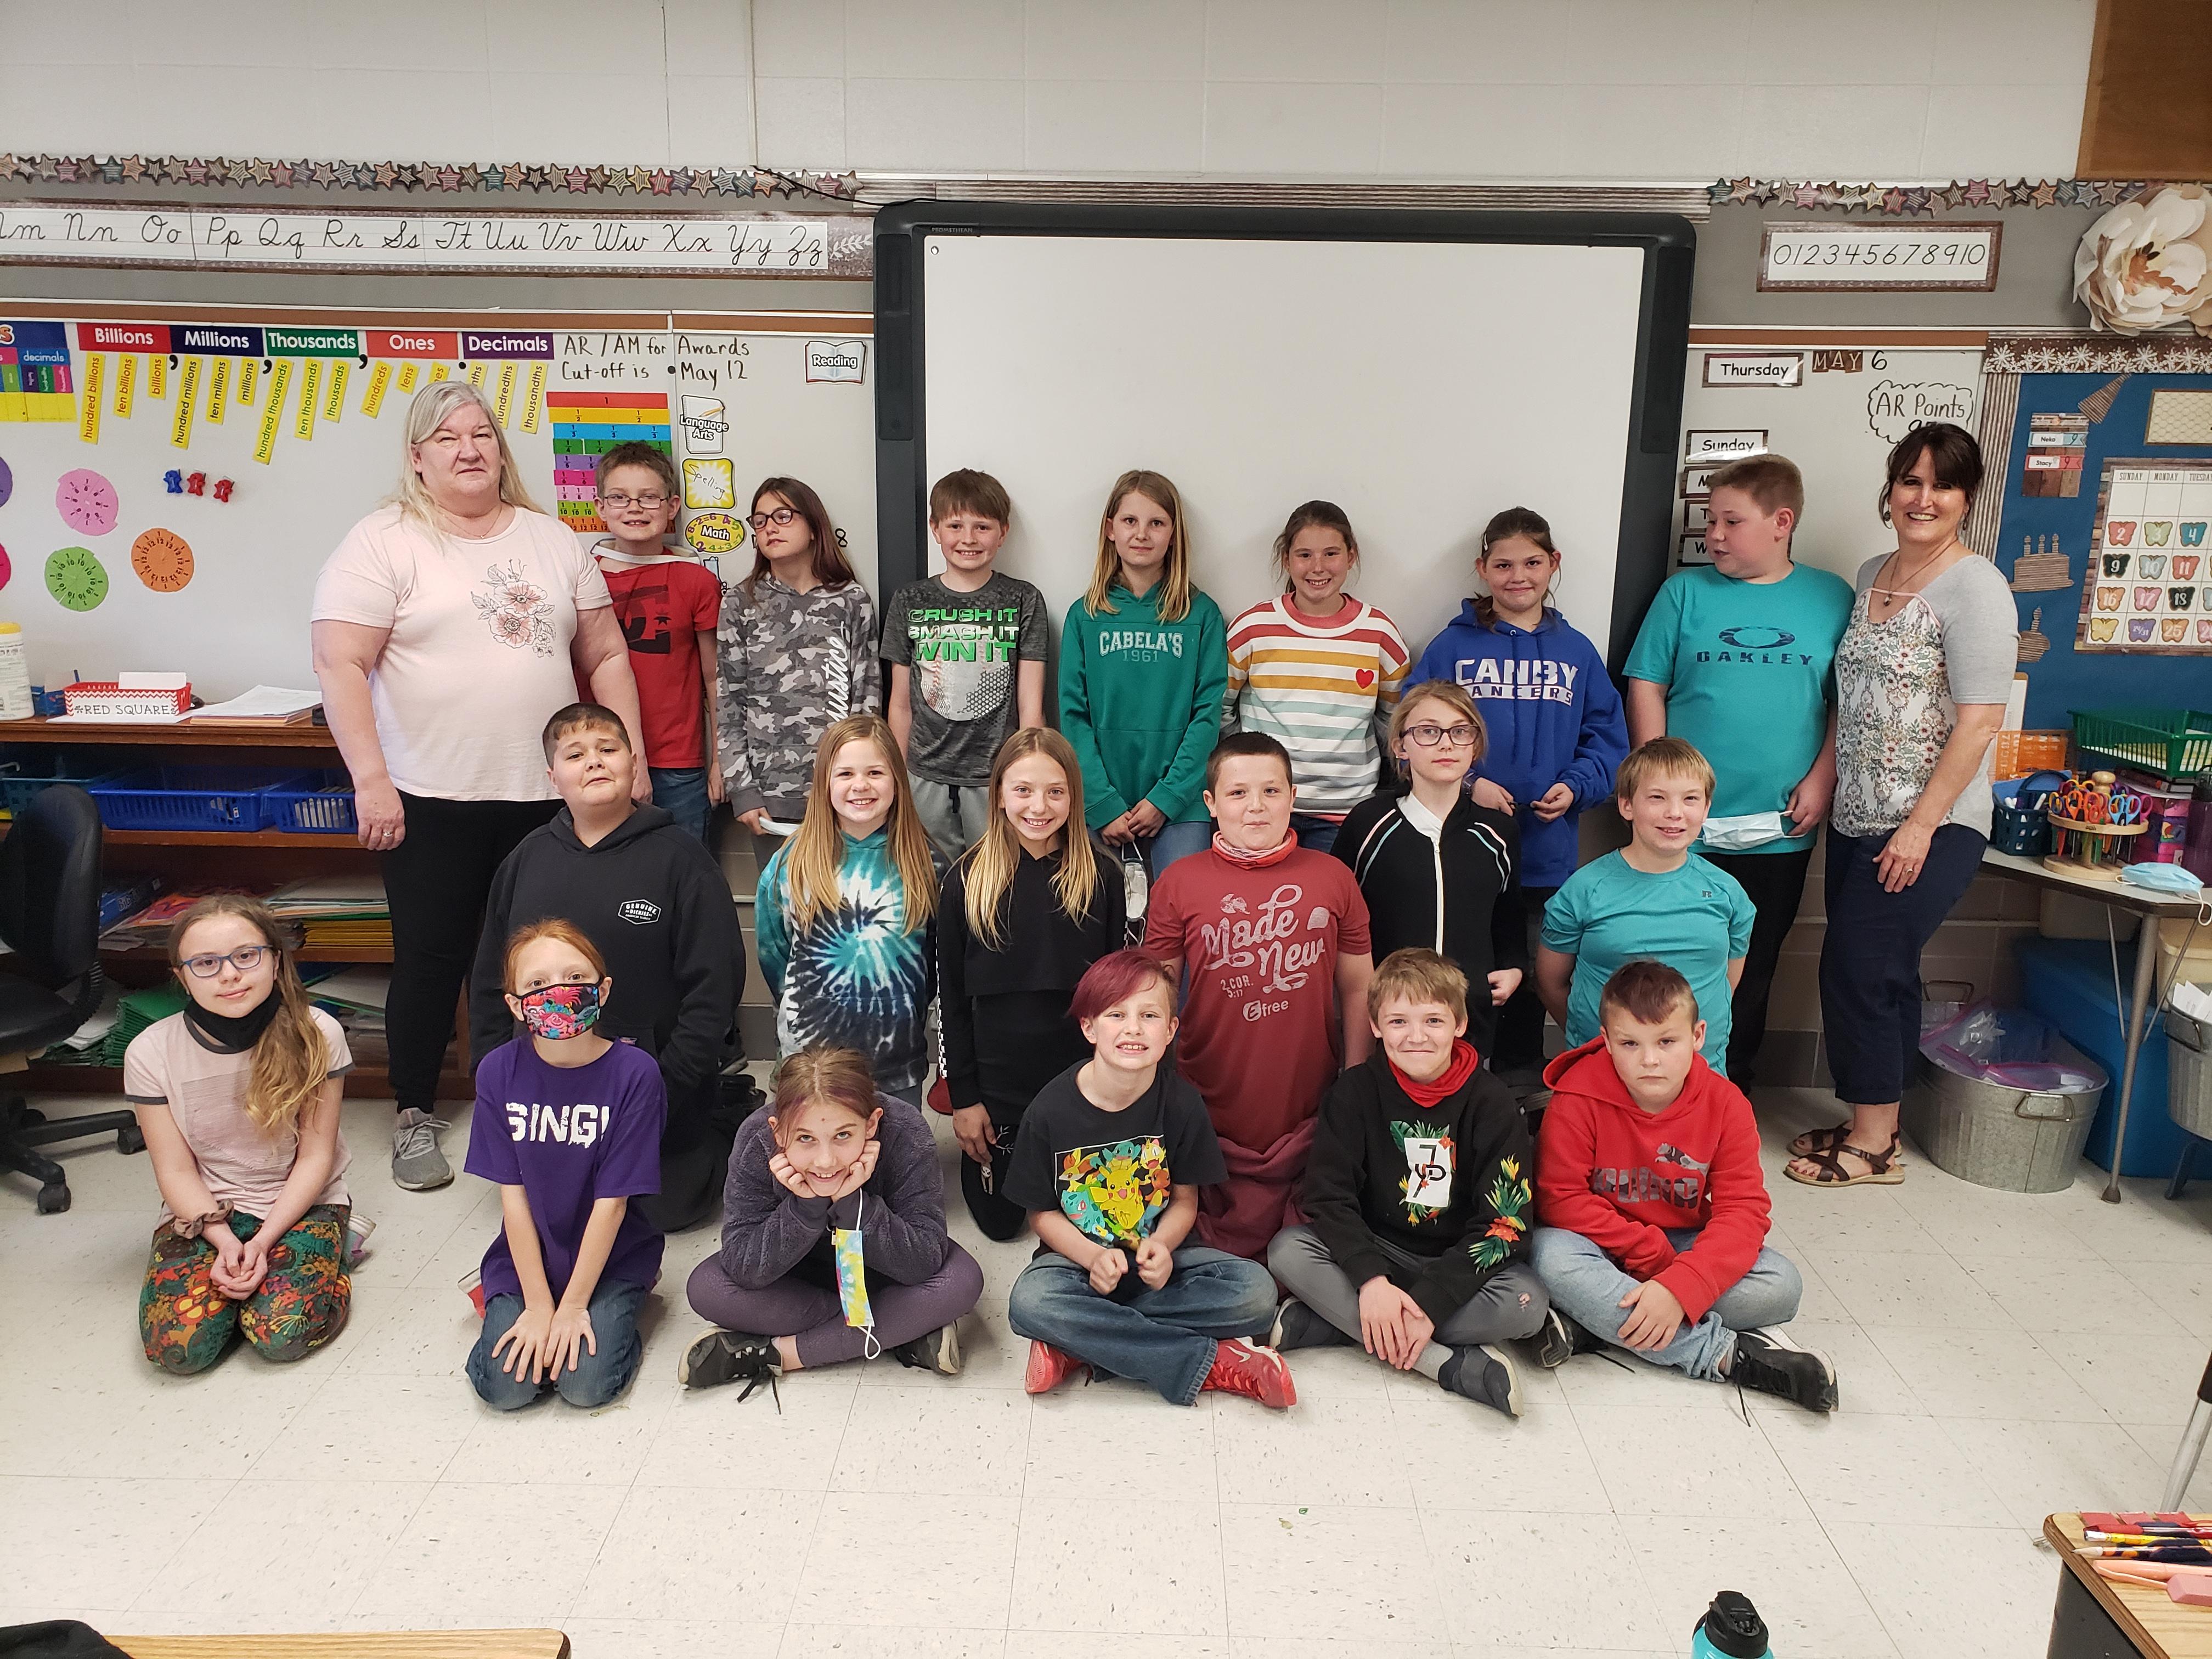 Ms. Berckes's Class